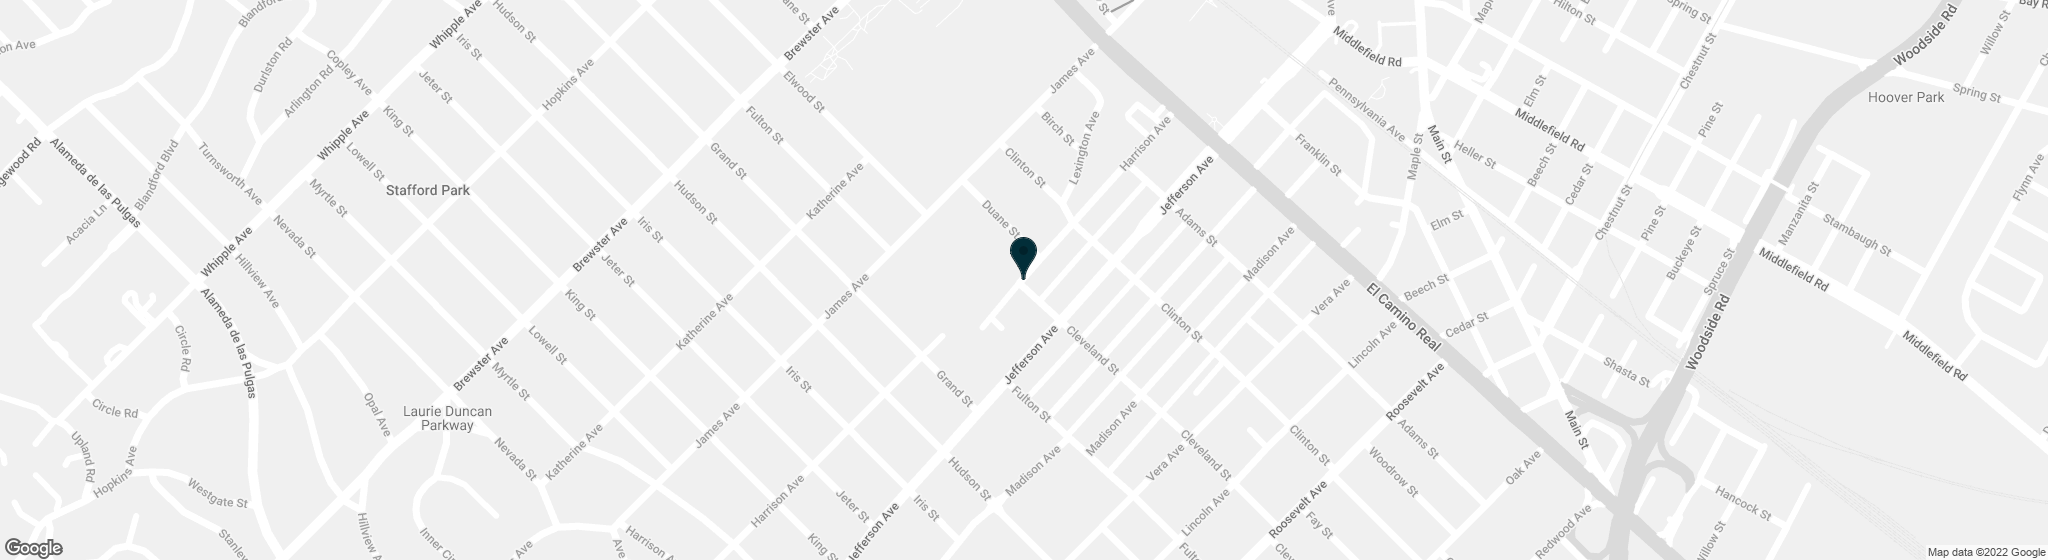 489 Harrison Redwood City CA 94062